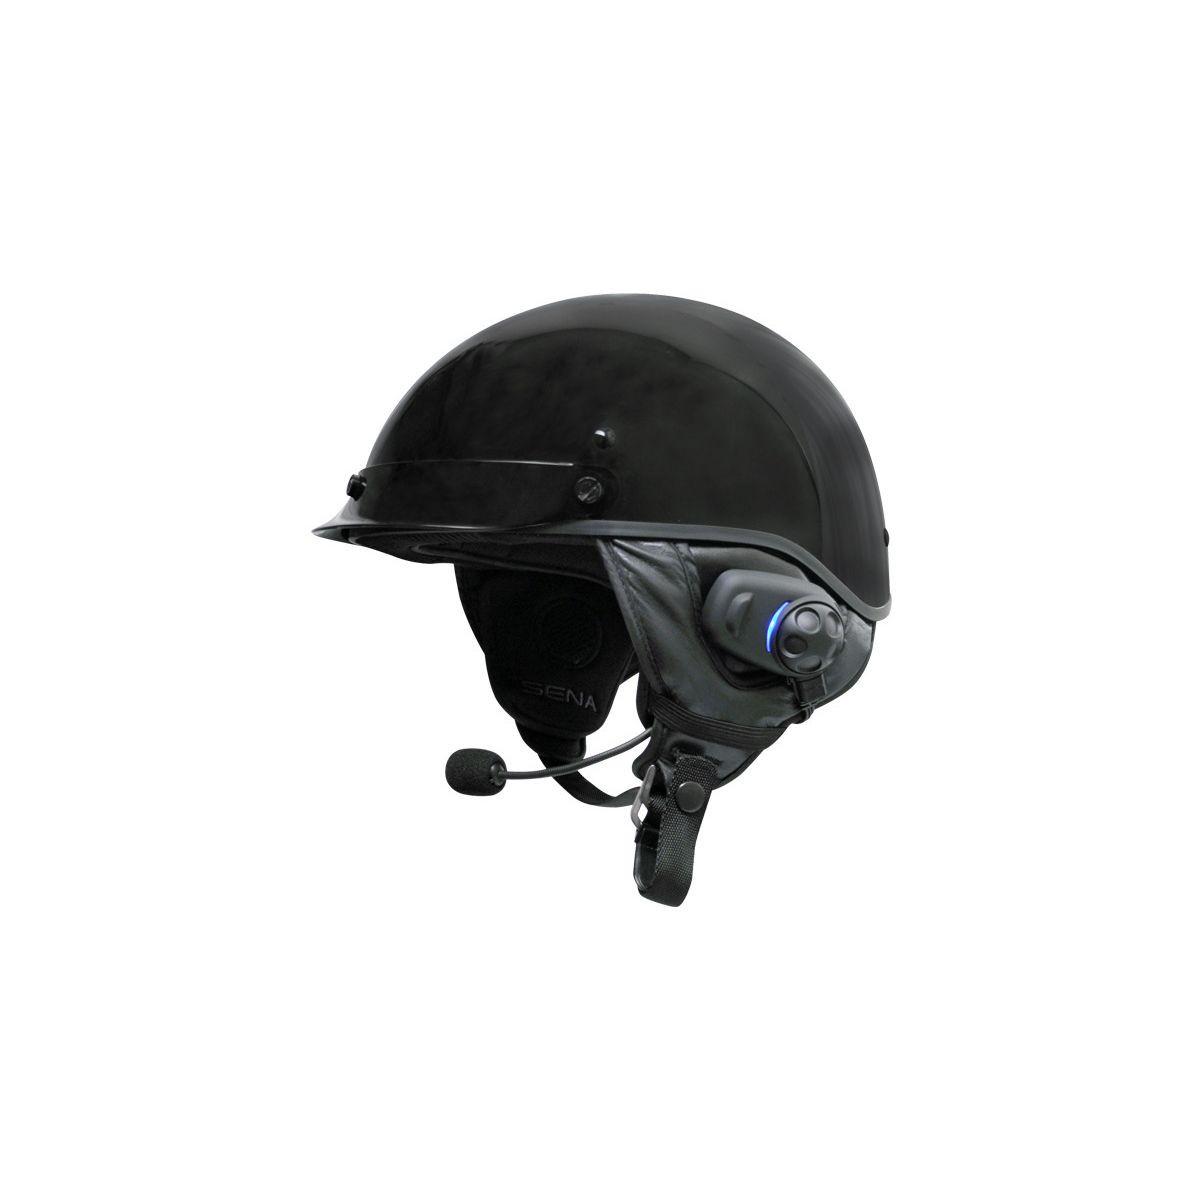 eee0e3a63b3 Harley Half Helmet And Boom Audio Headset Harley Davidson Forums. Sena  Sph10h Fm Bluetooth Intercom With Dual Fm Tuner